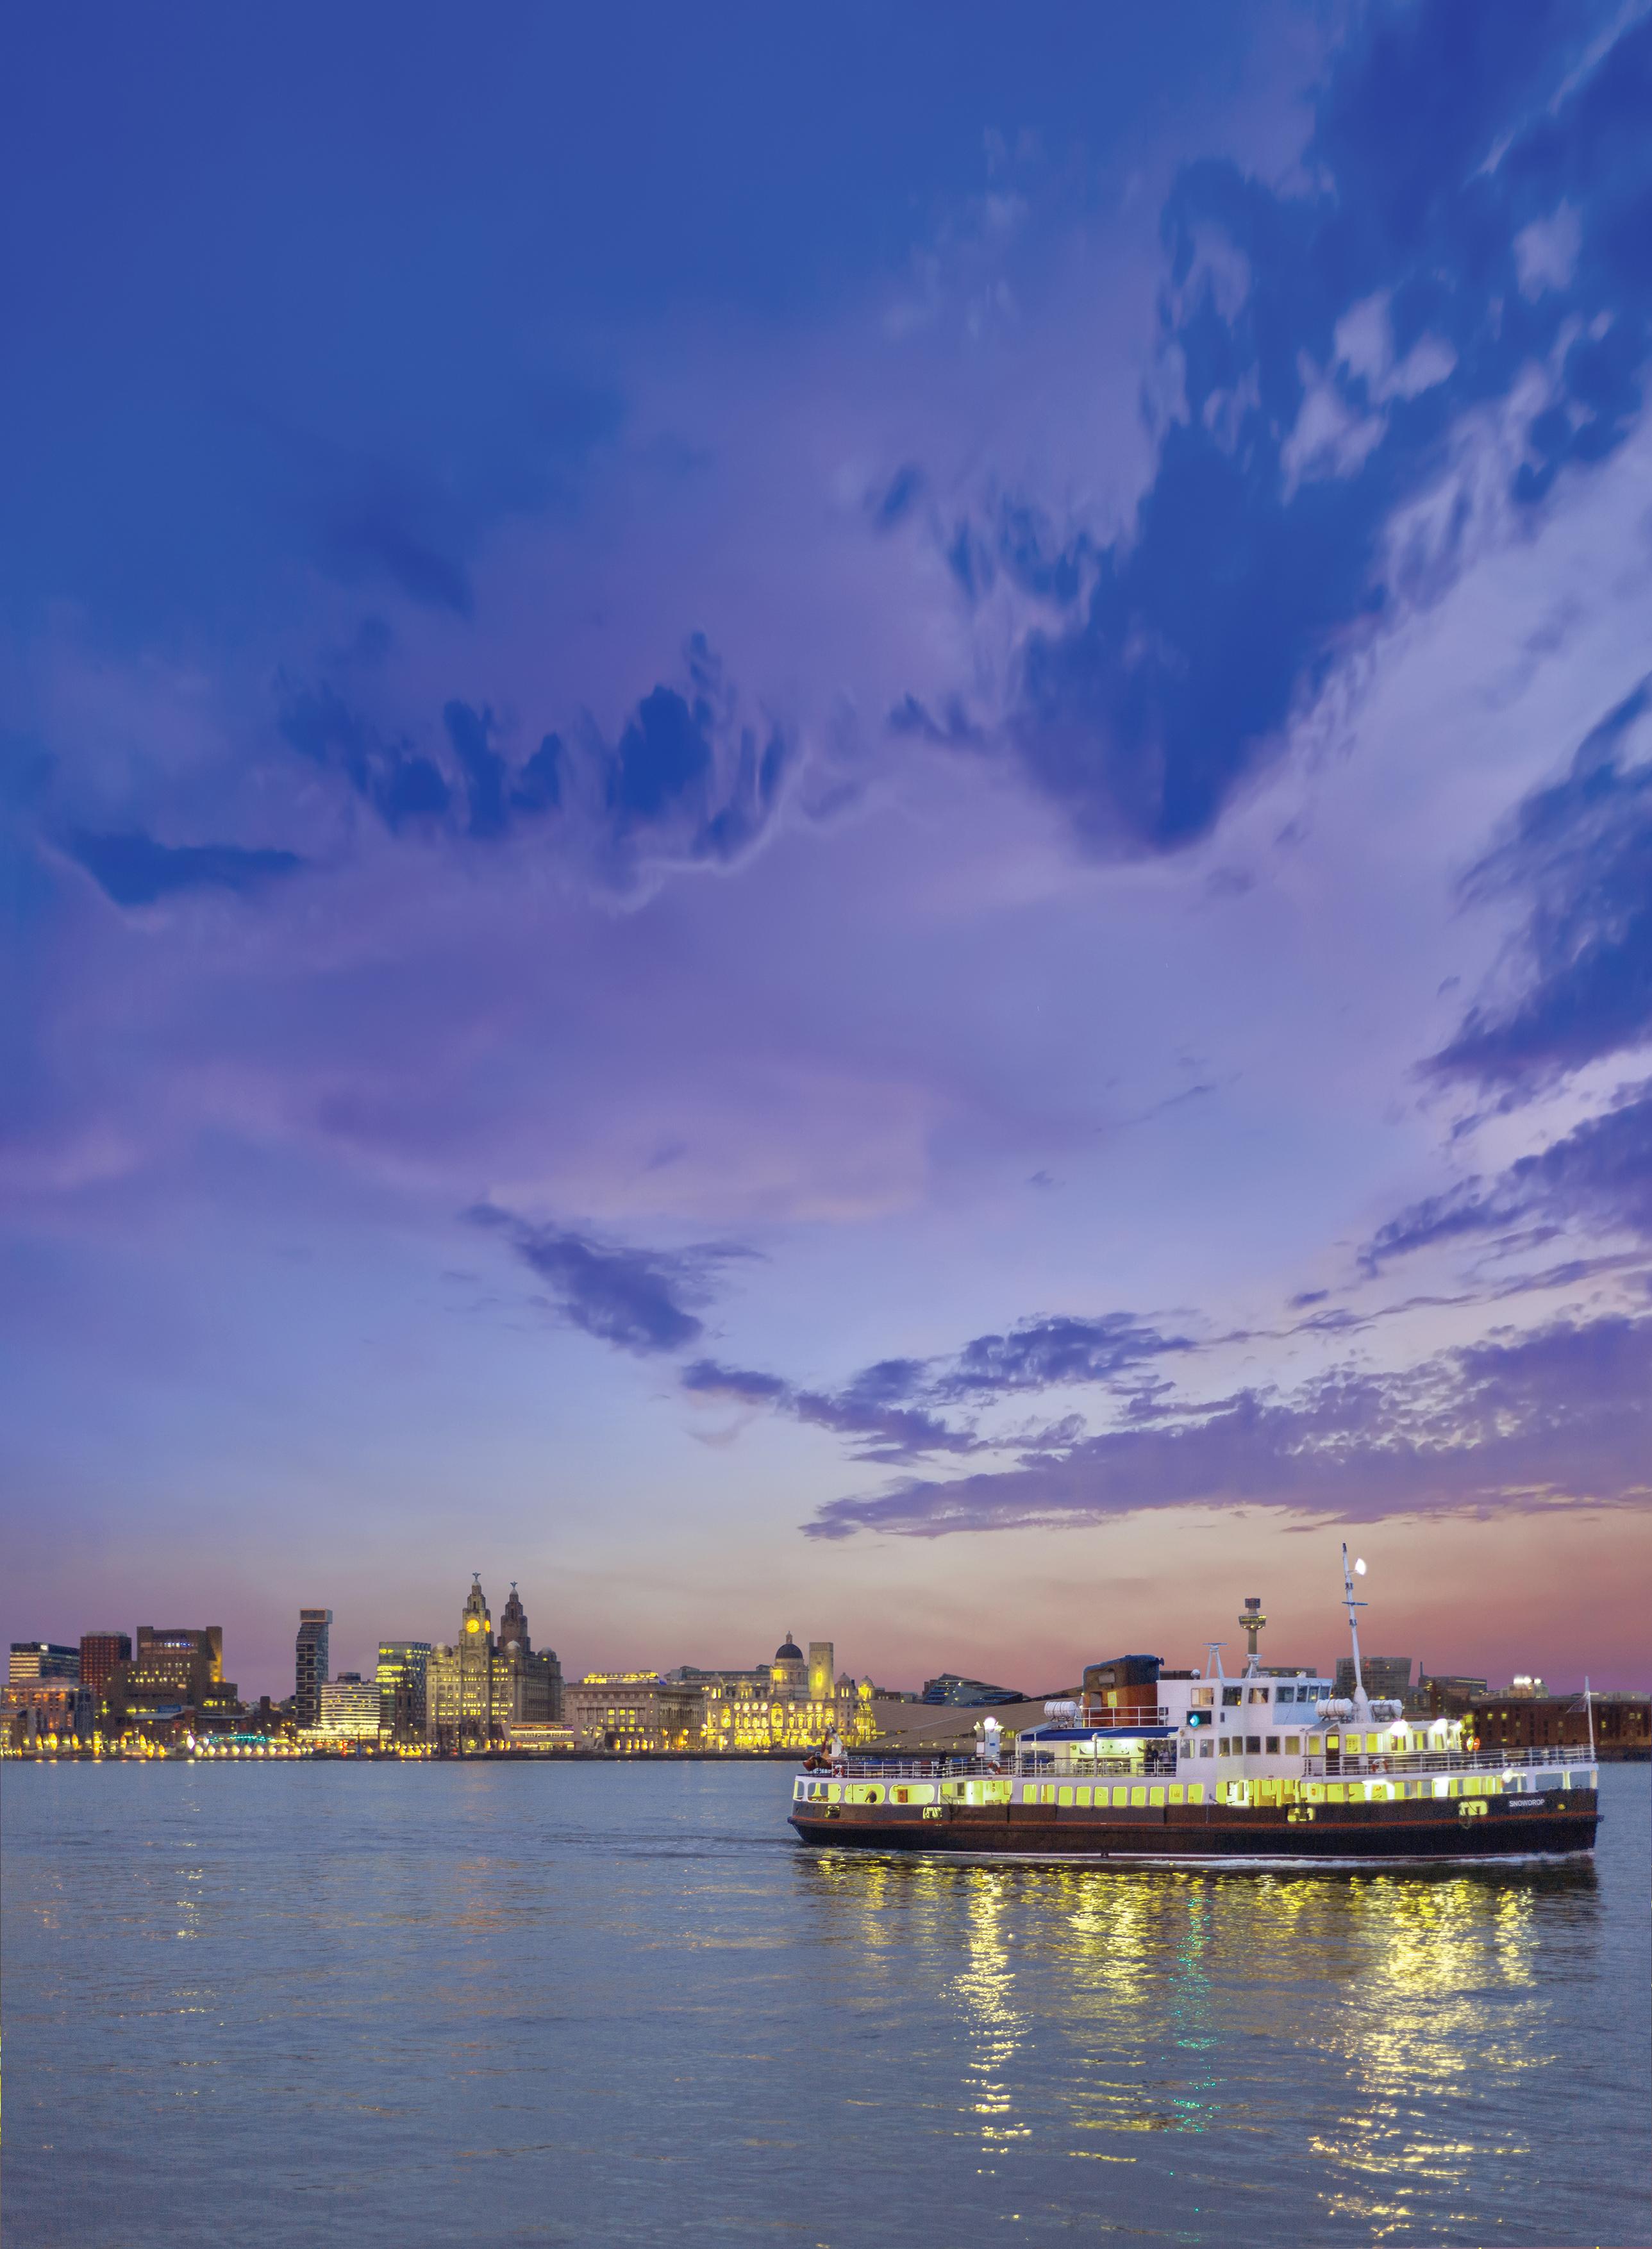 Summer cruise ferry image